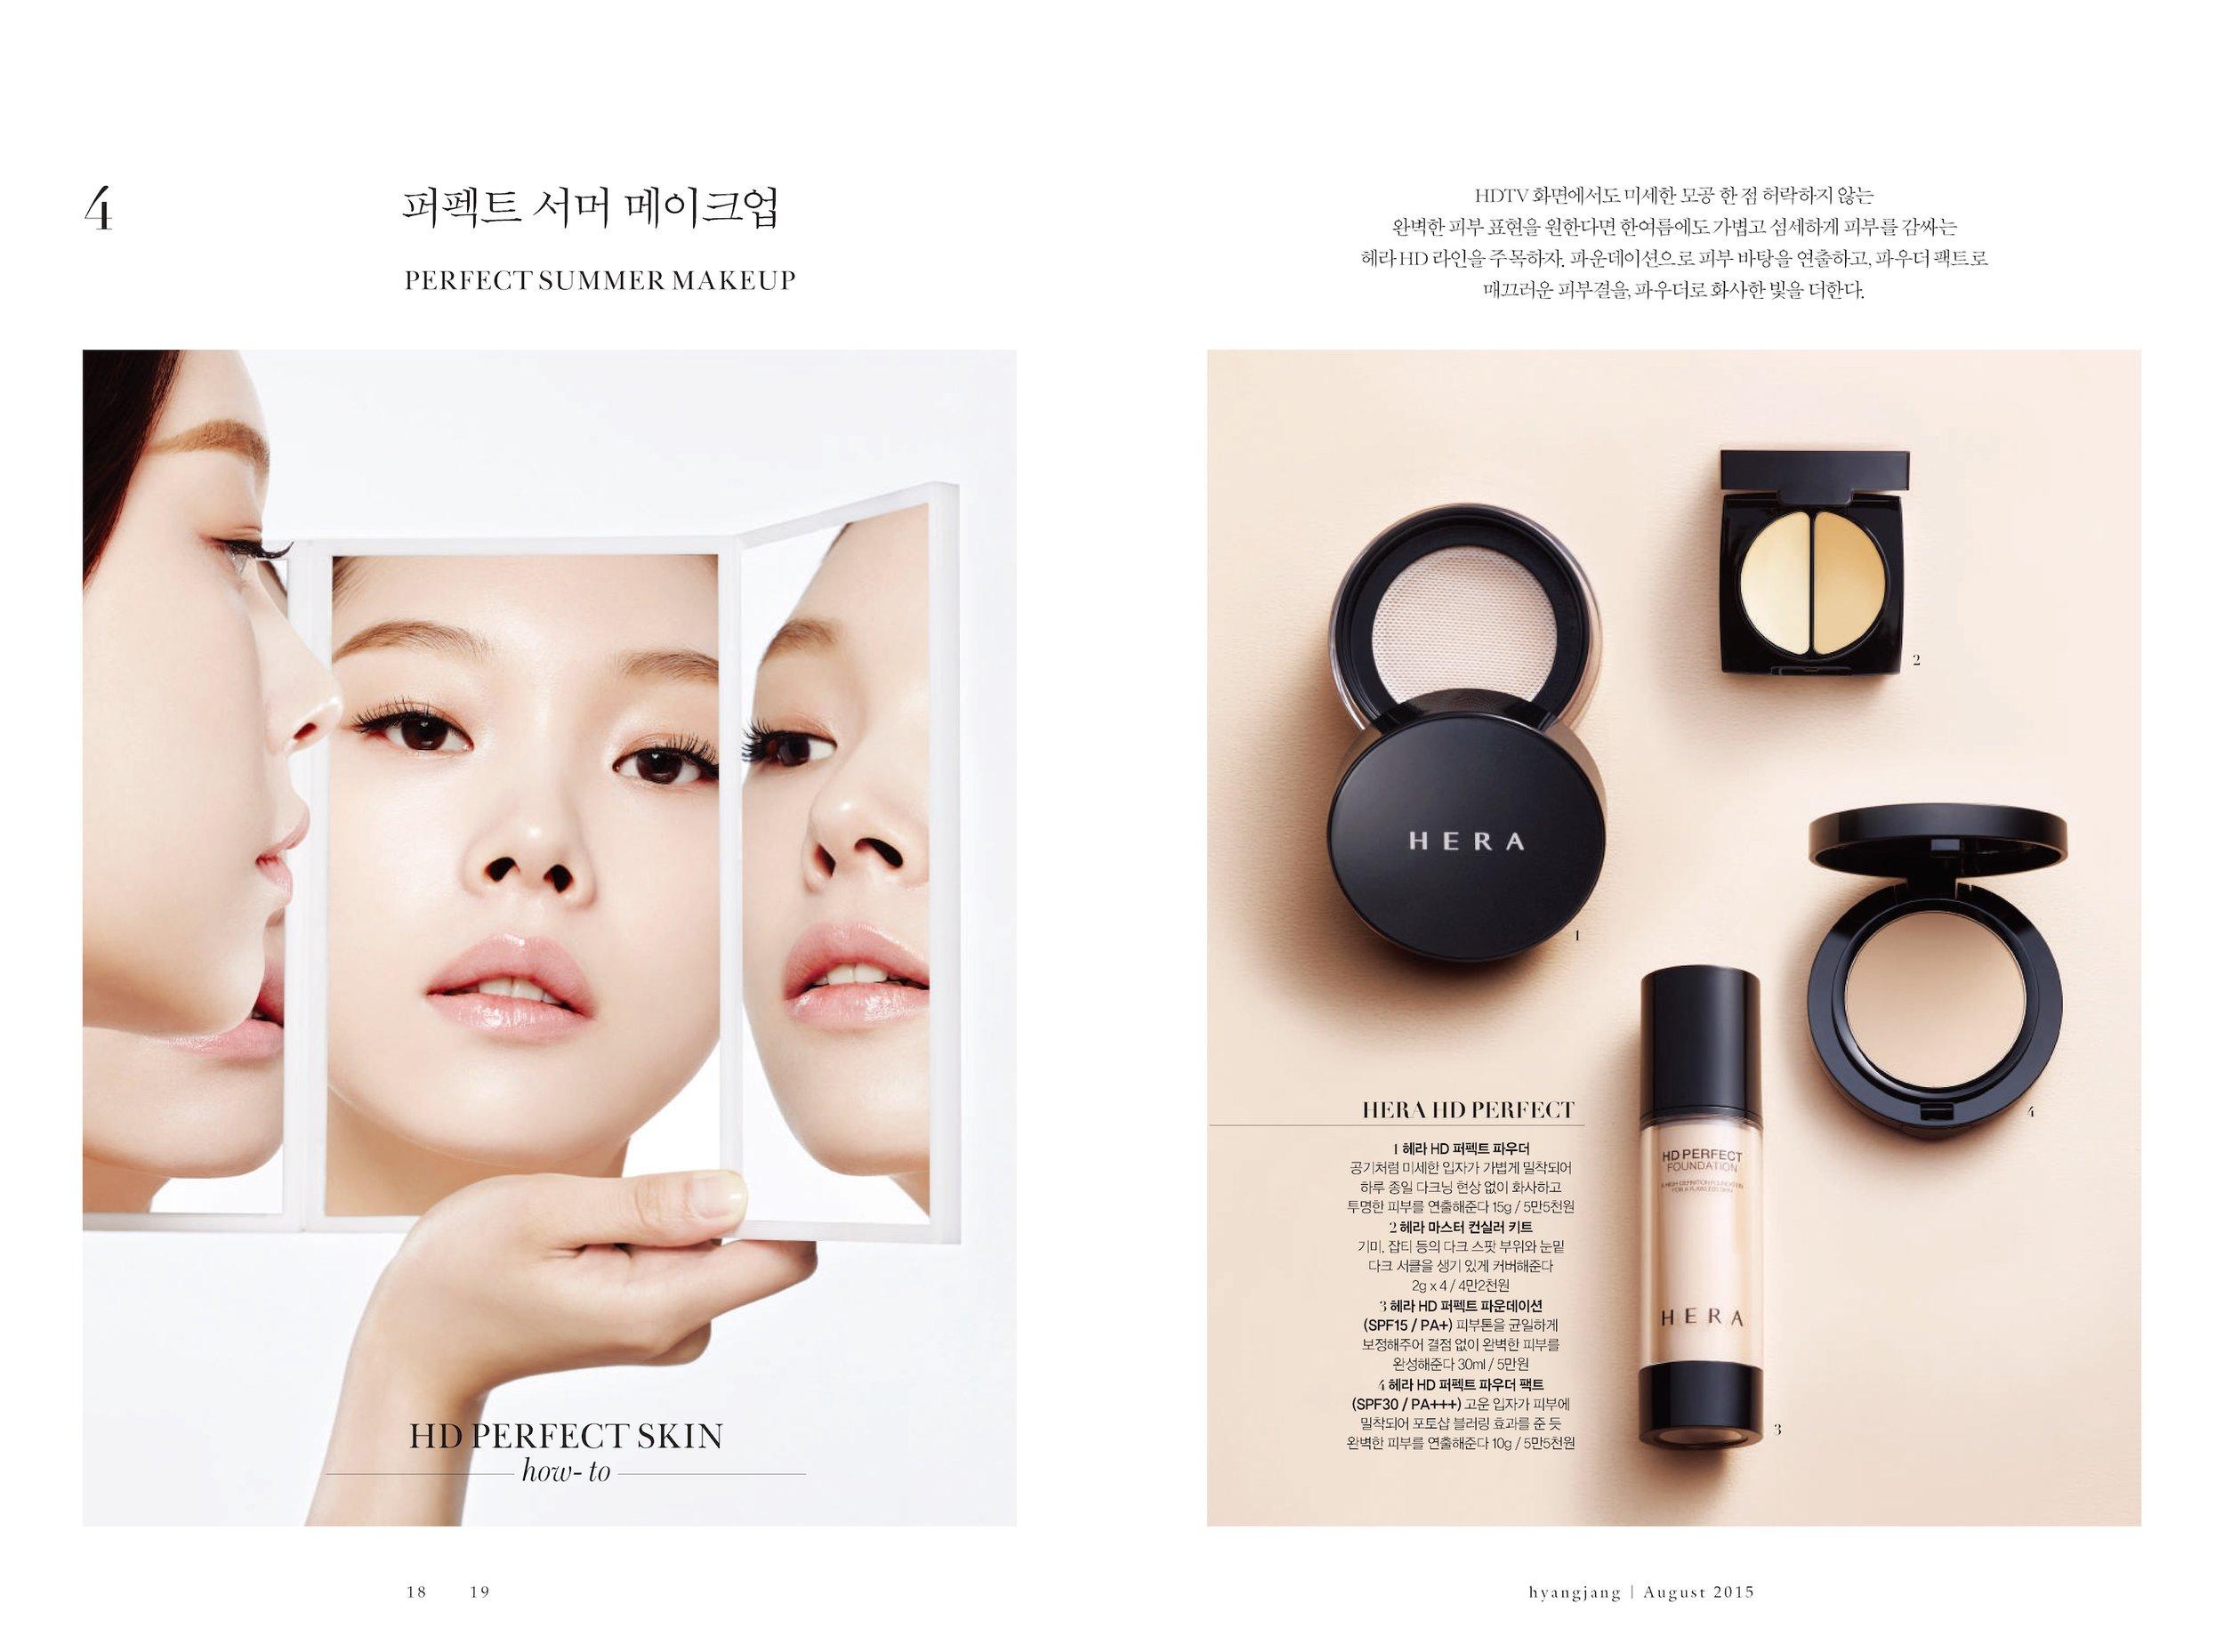 hyangjang-201508_페이지_10.jpeg